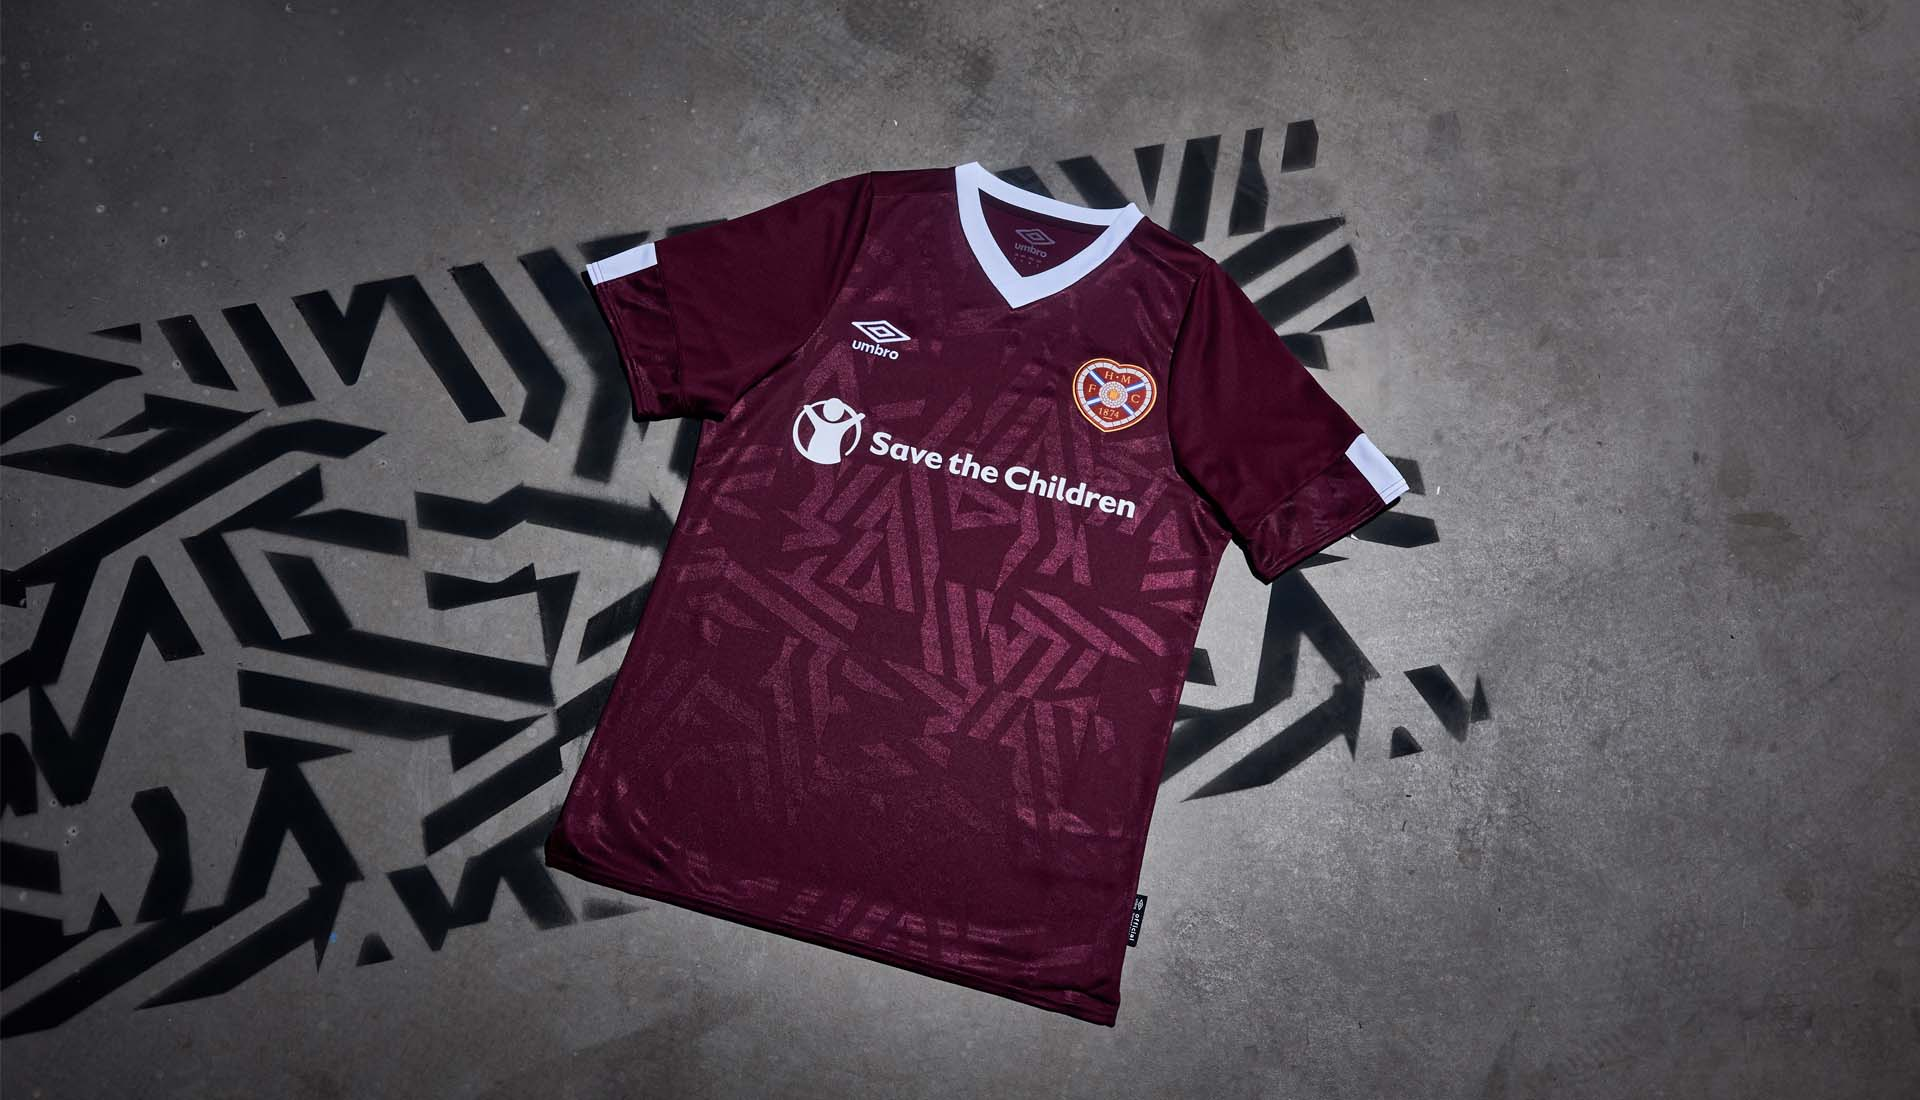 22cae2aee Umbro Launch Hearts 2019/20 Home Shirt - SoccerBible